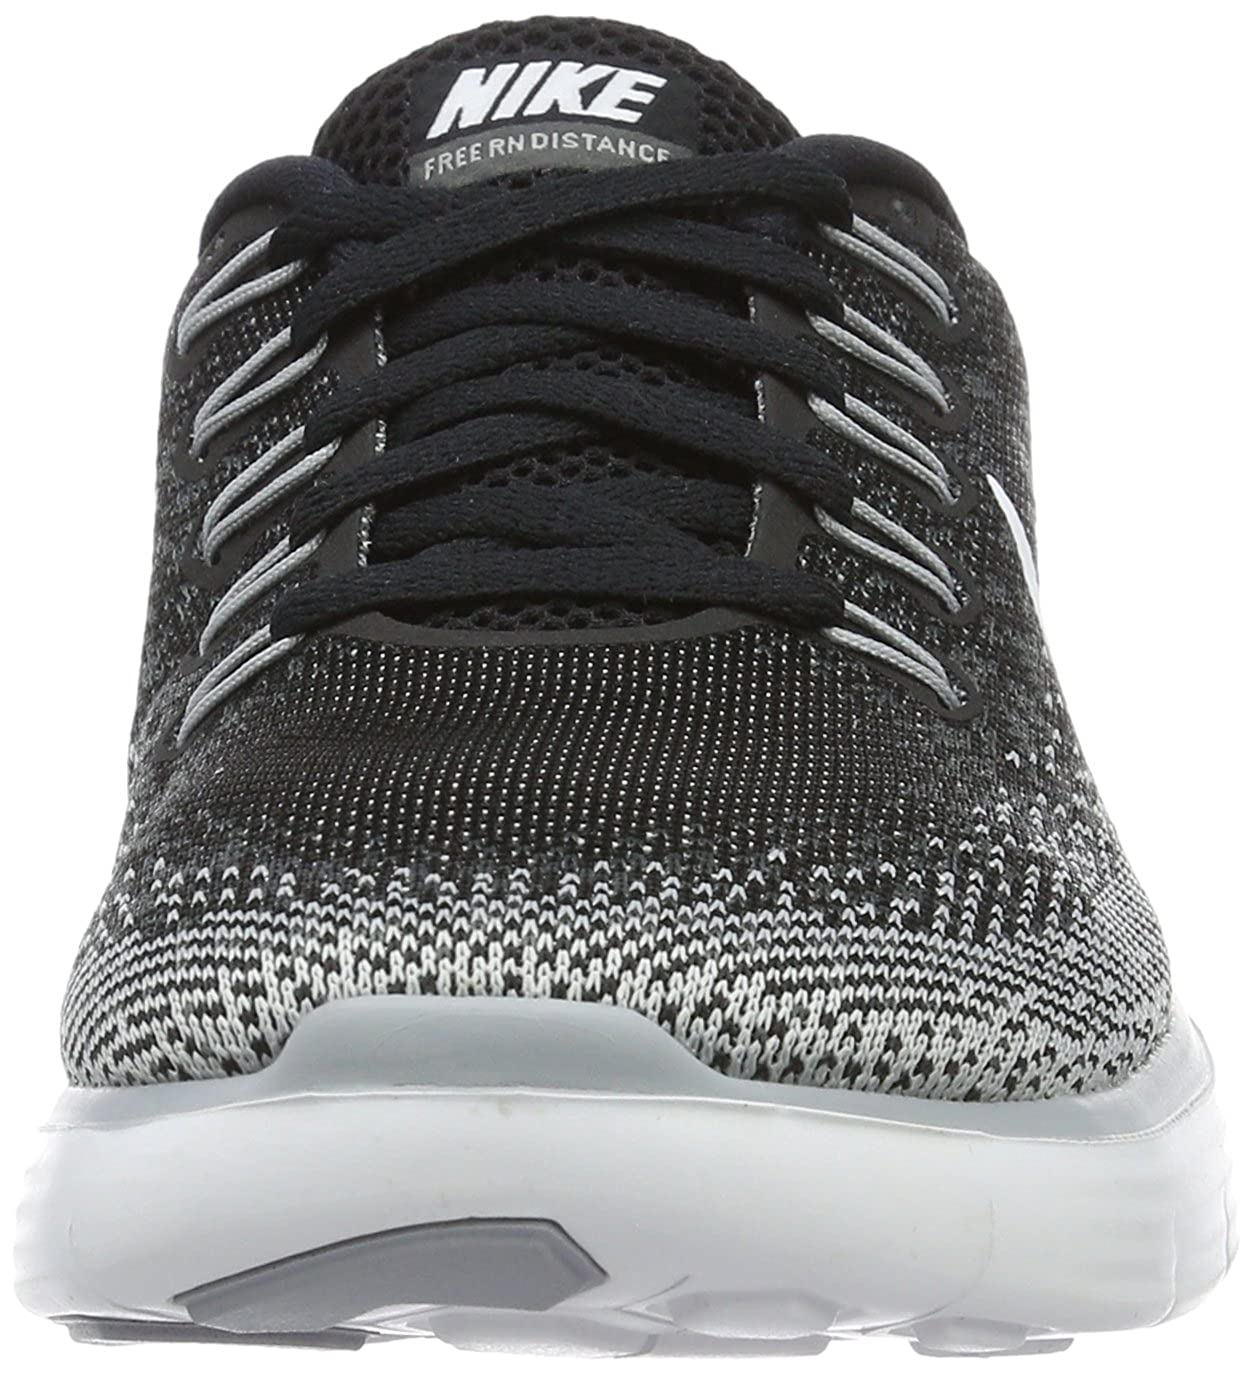 a0075c3abb51 Nike WMNS Free RN Distance